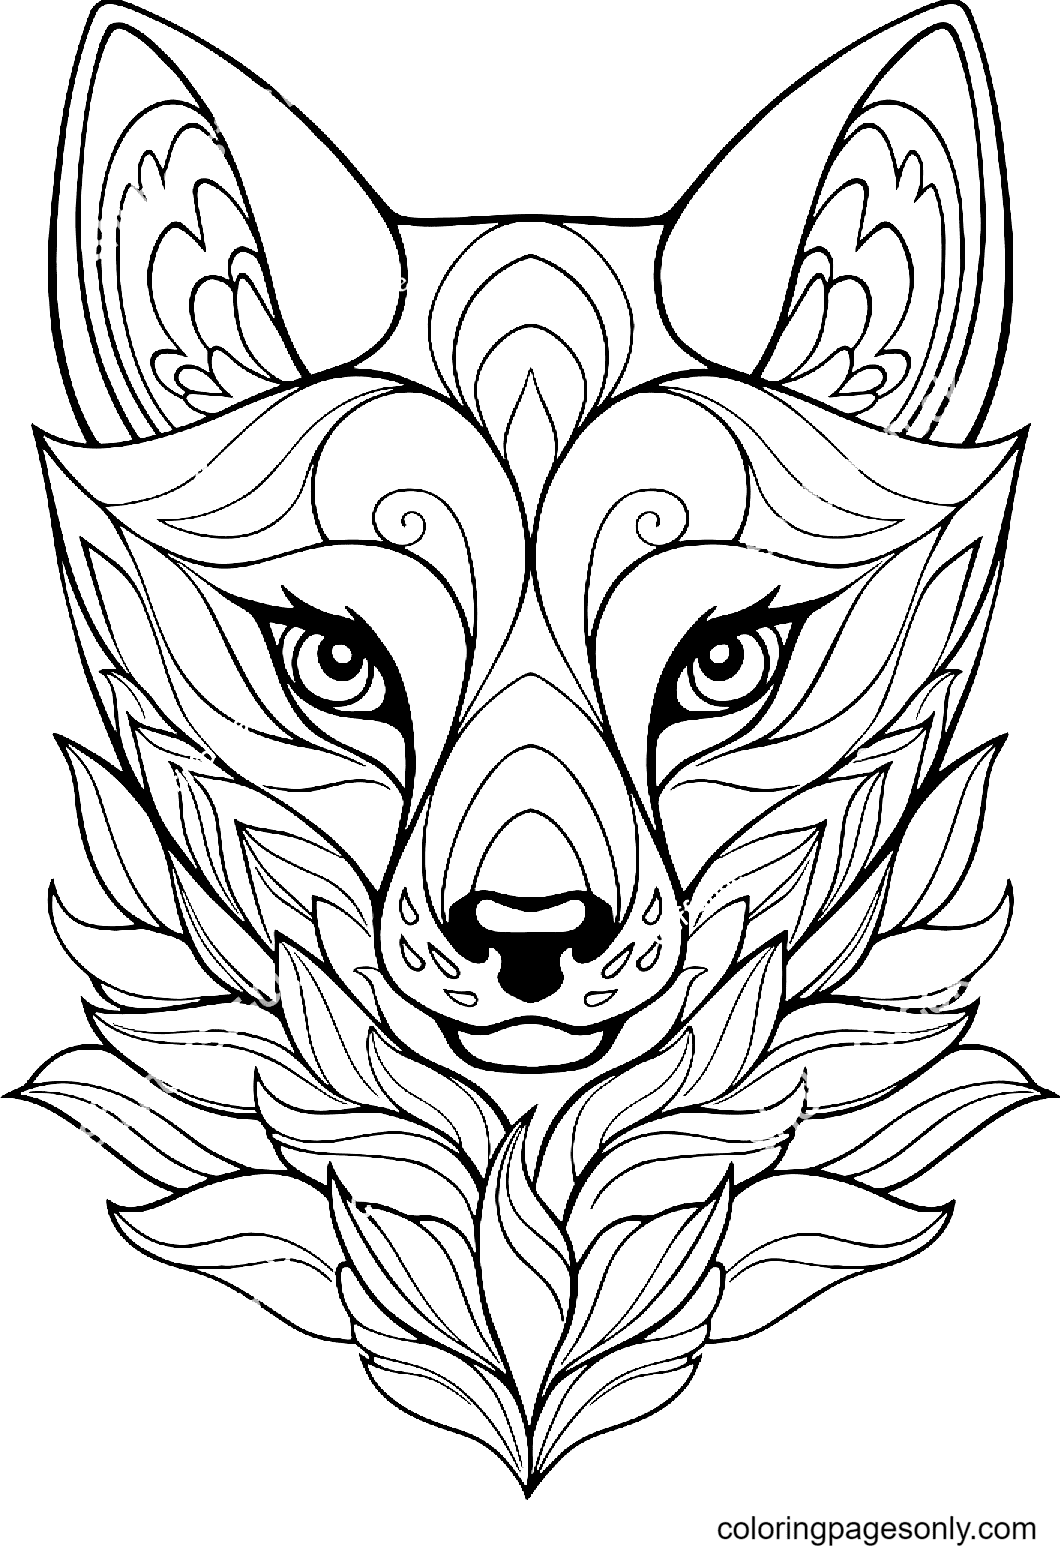 Fox Head Line Art Coloring Page